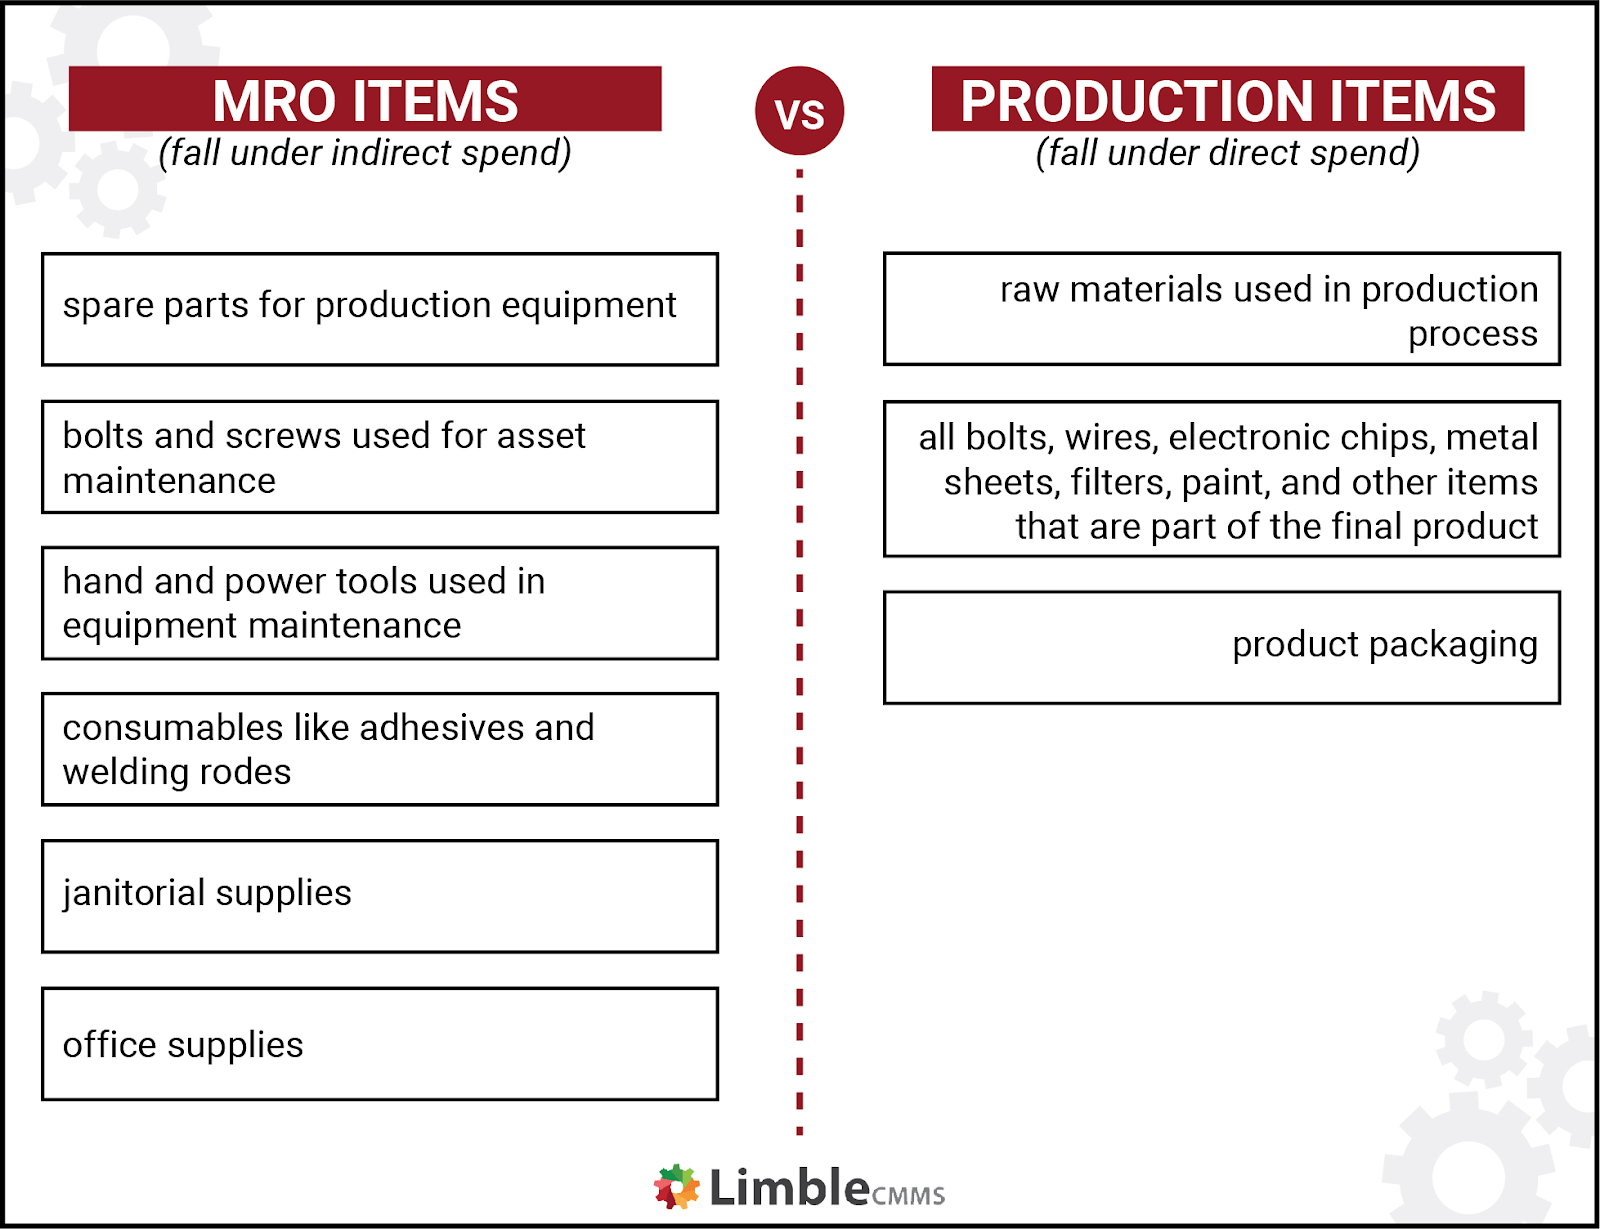 MRO items vs production items